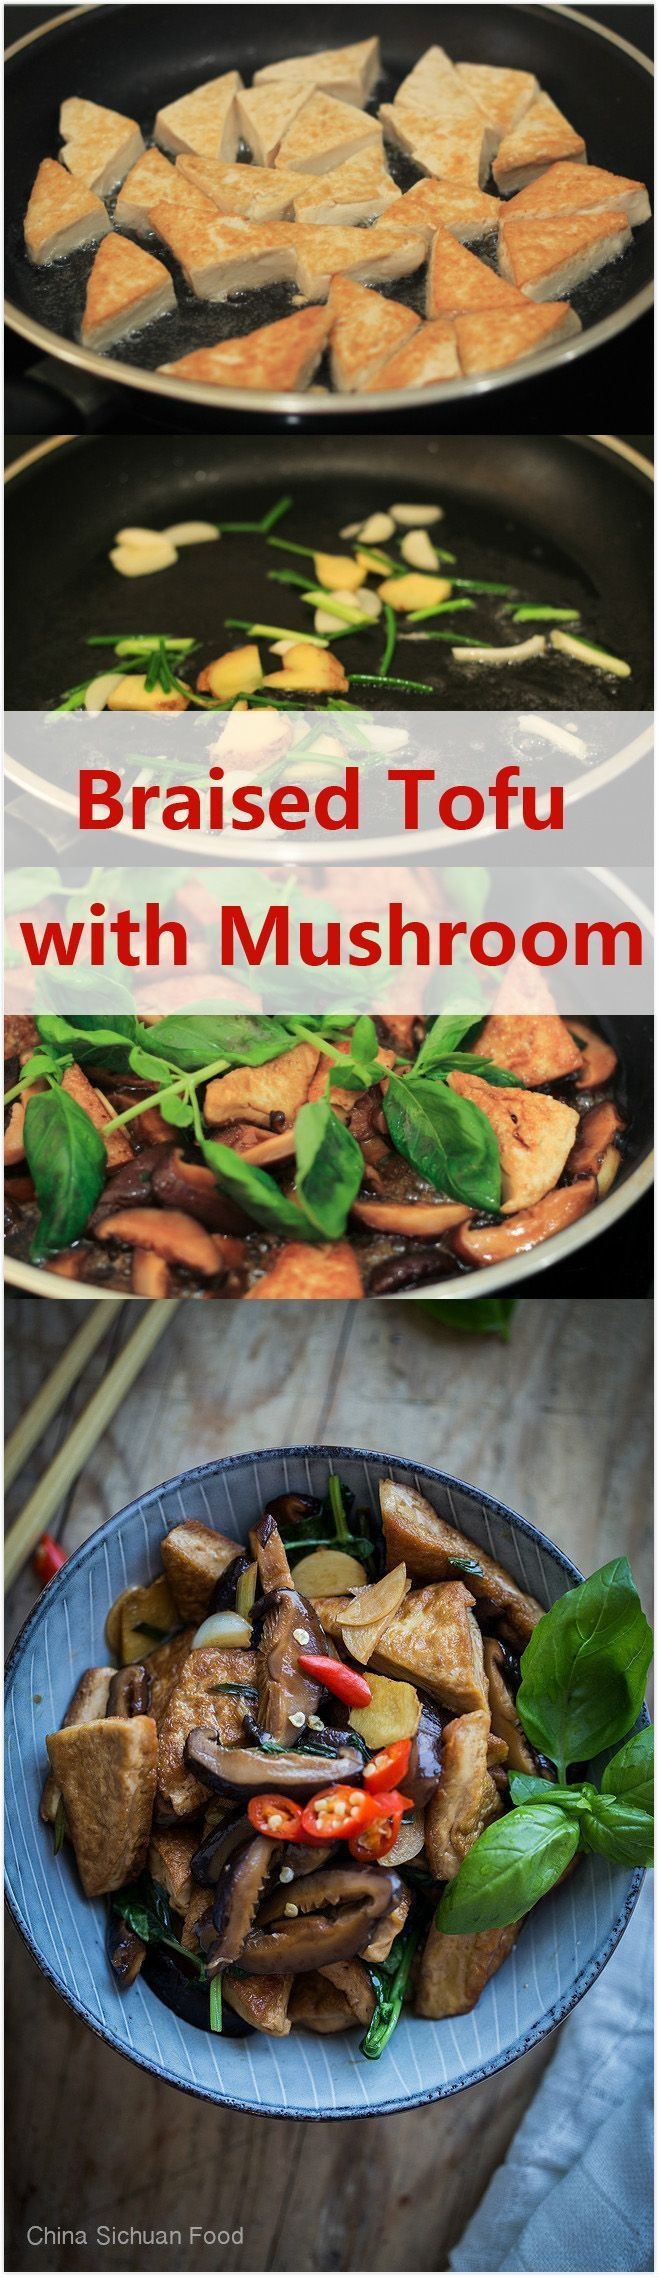 Braised Tofu with Chinese Mushroom 丨China Sichuan Food